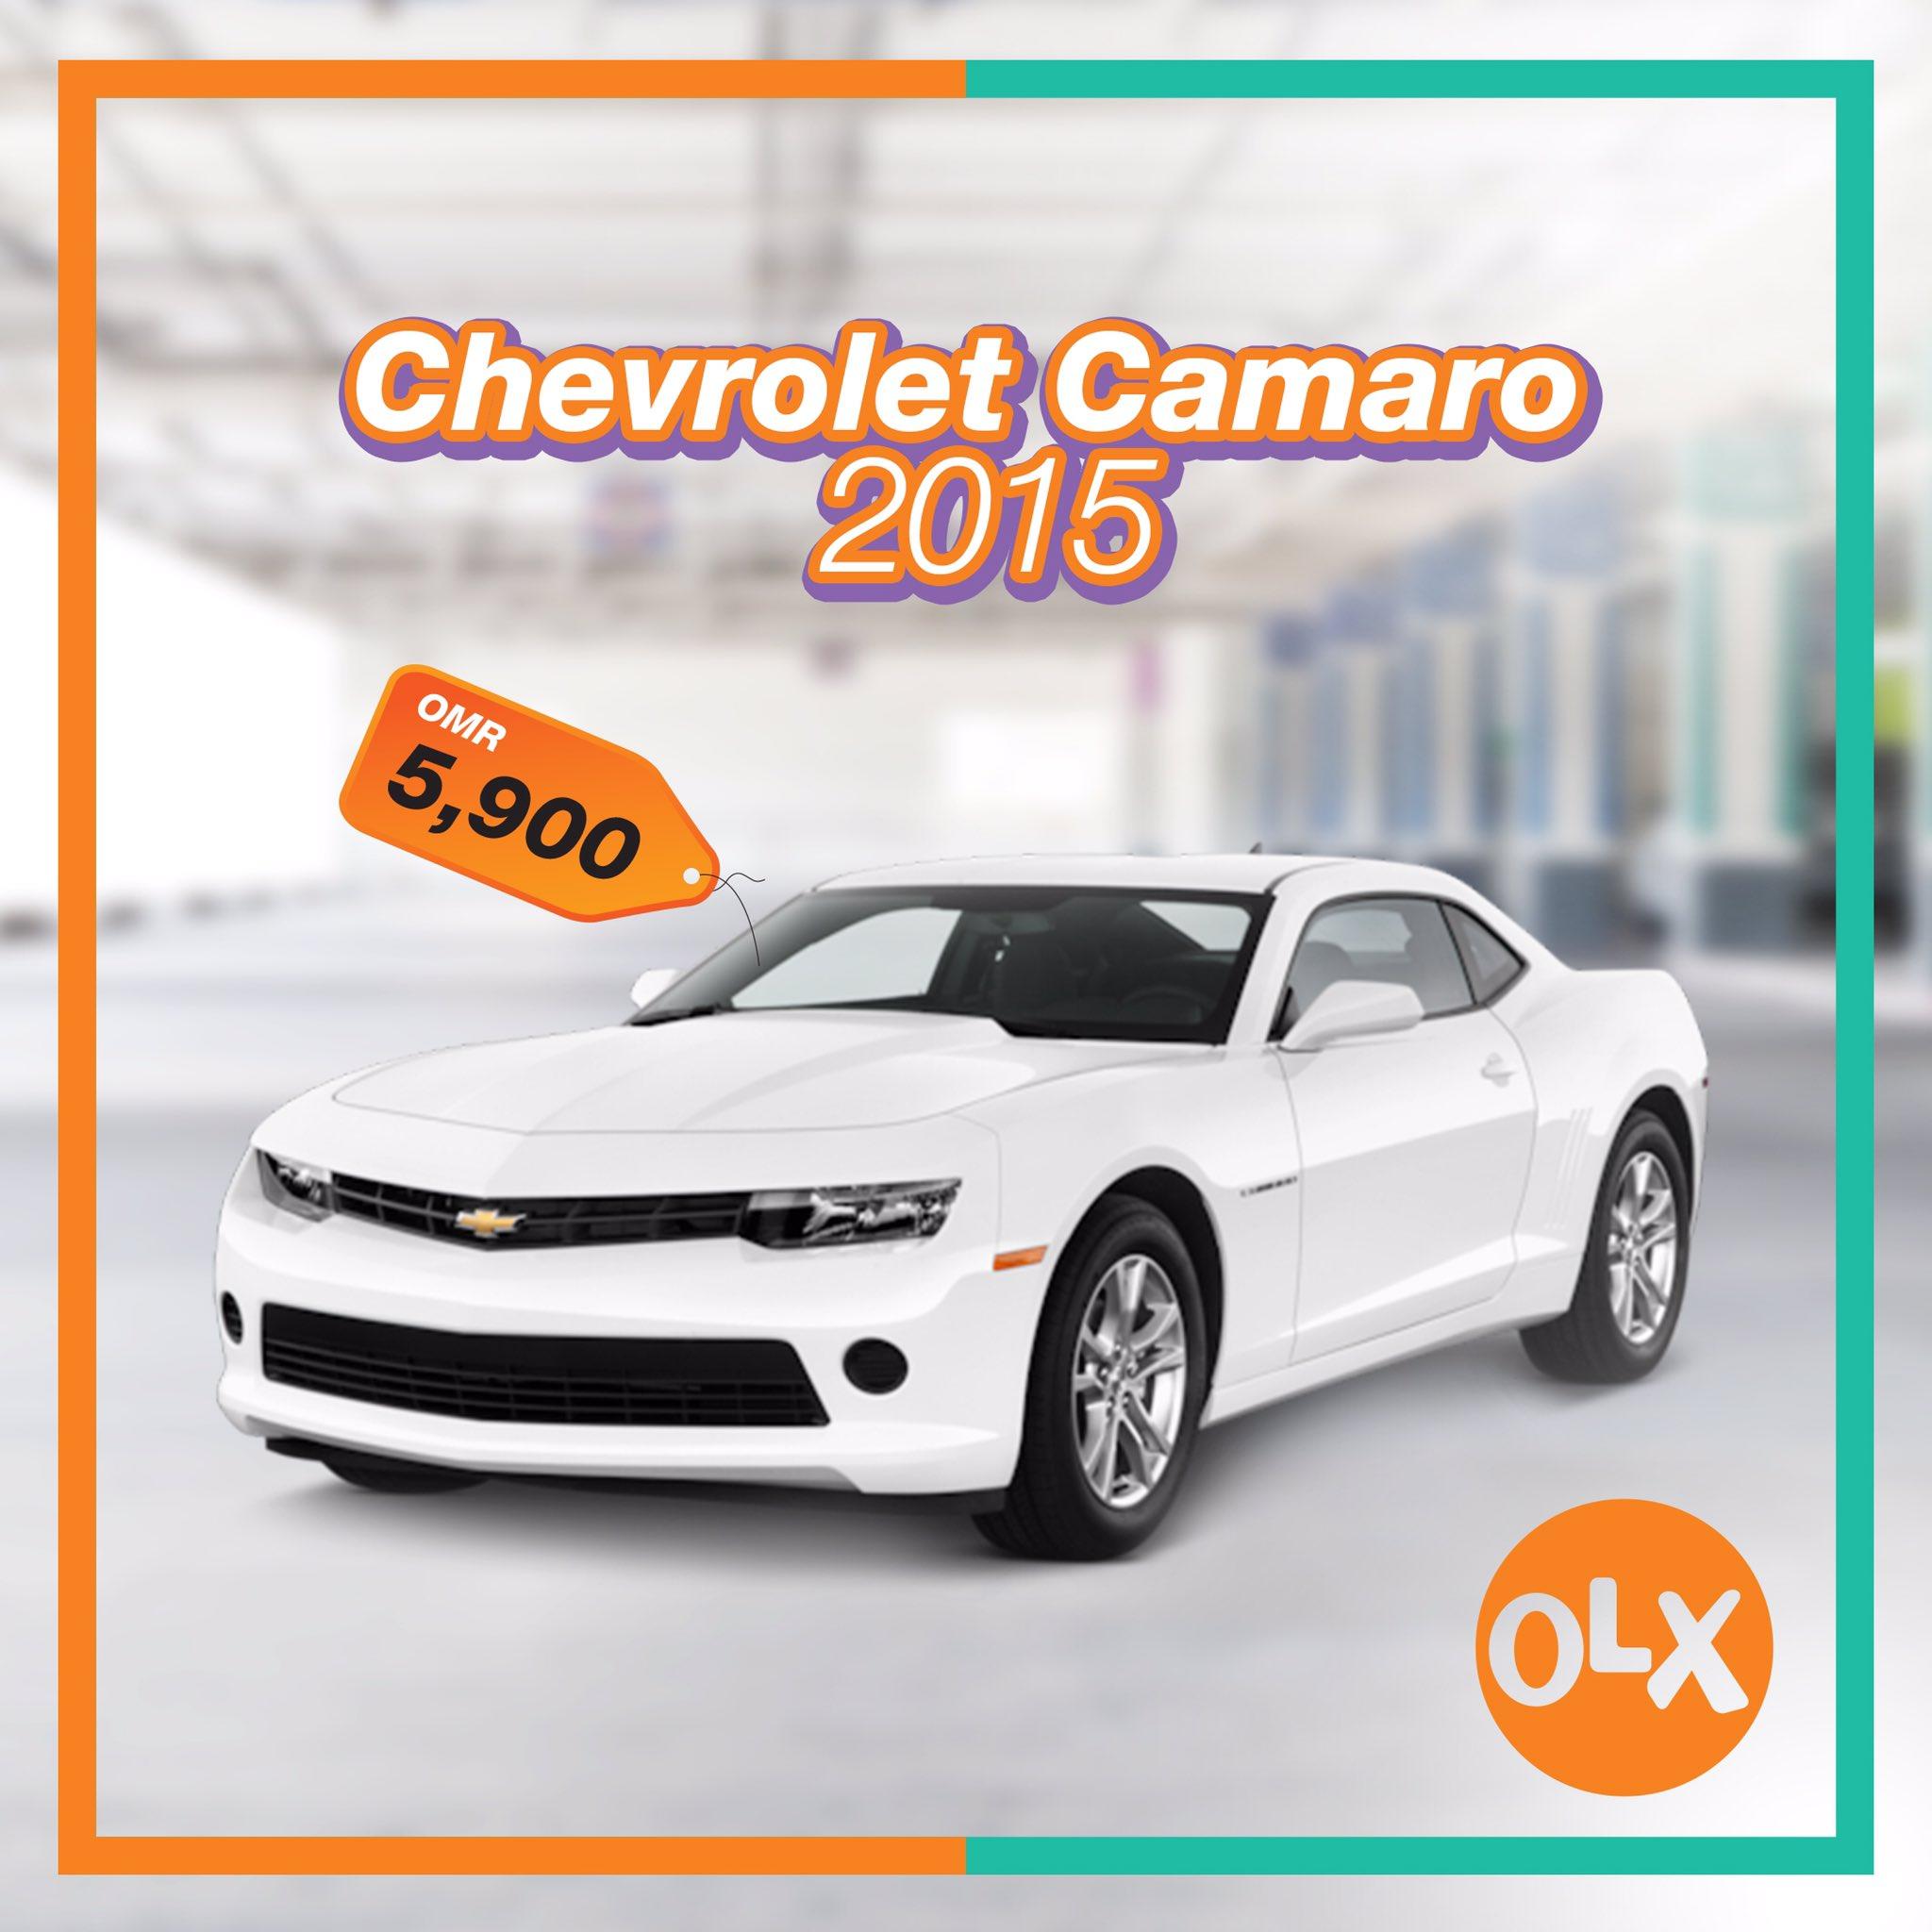 Kelebihan Chevrolet Camaro Olx Perbandingan Harga